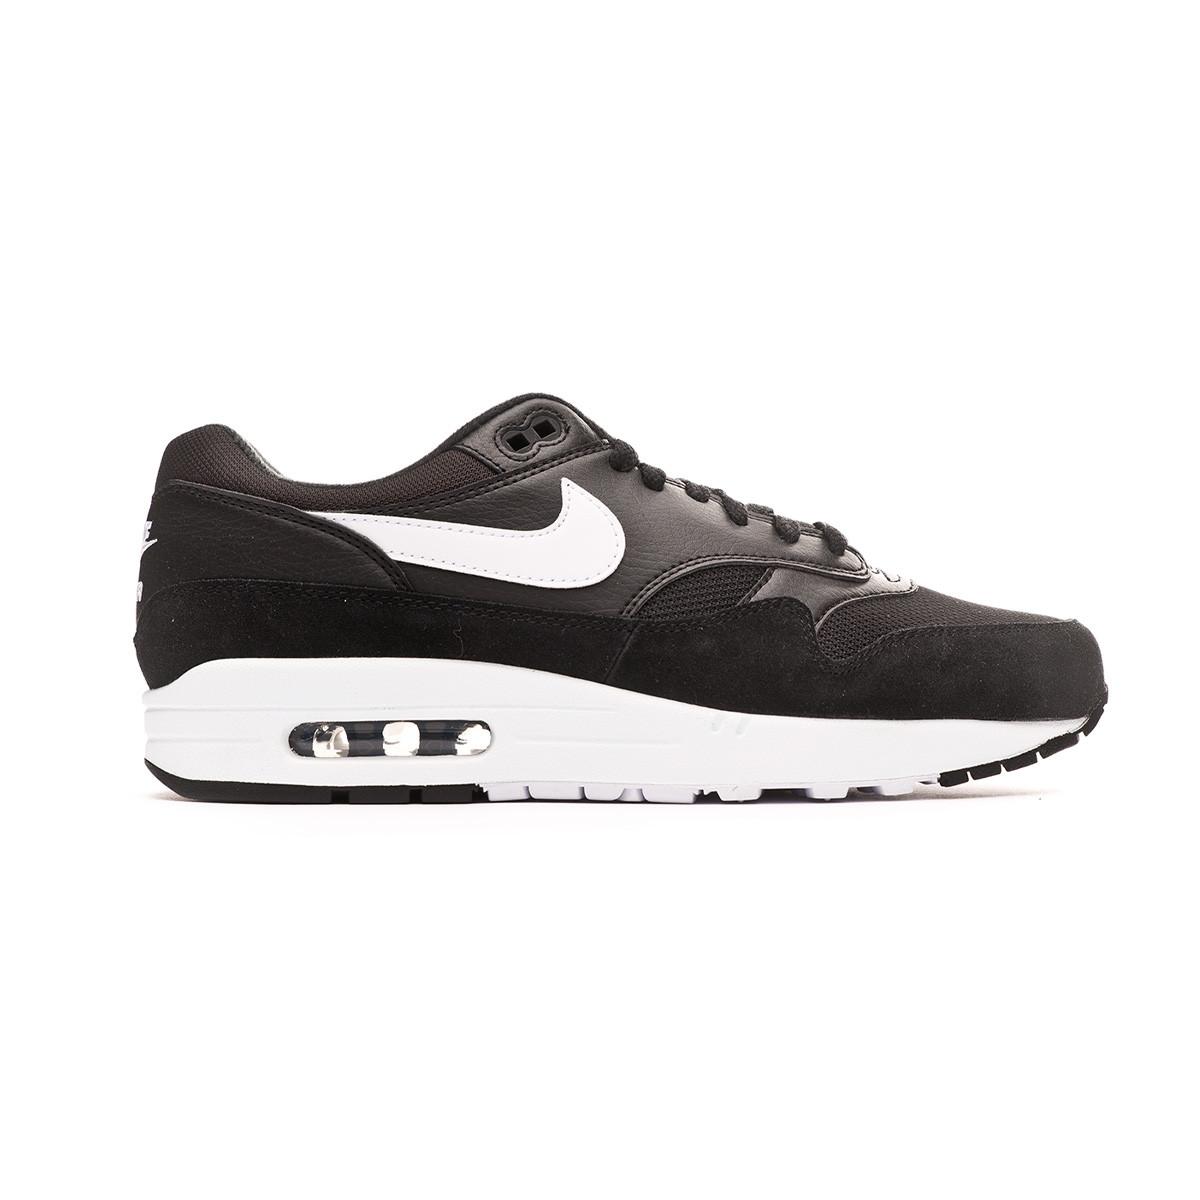 019caa9fd2 Trainers Nike Air Max 1 Black-White - Football store Fútbol Emotion